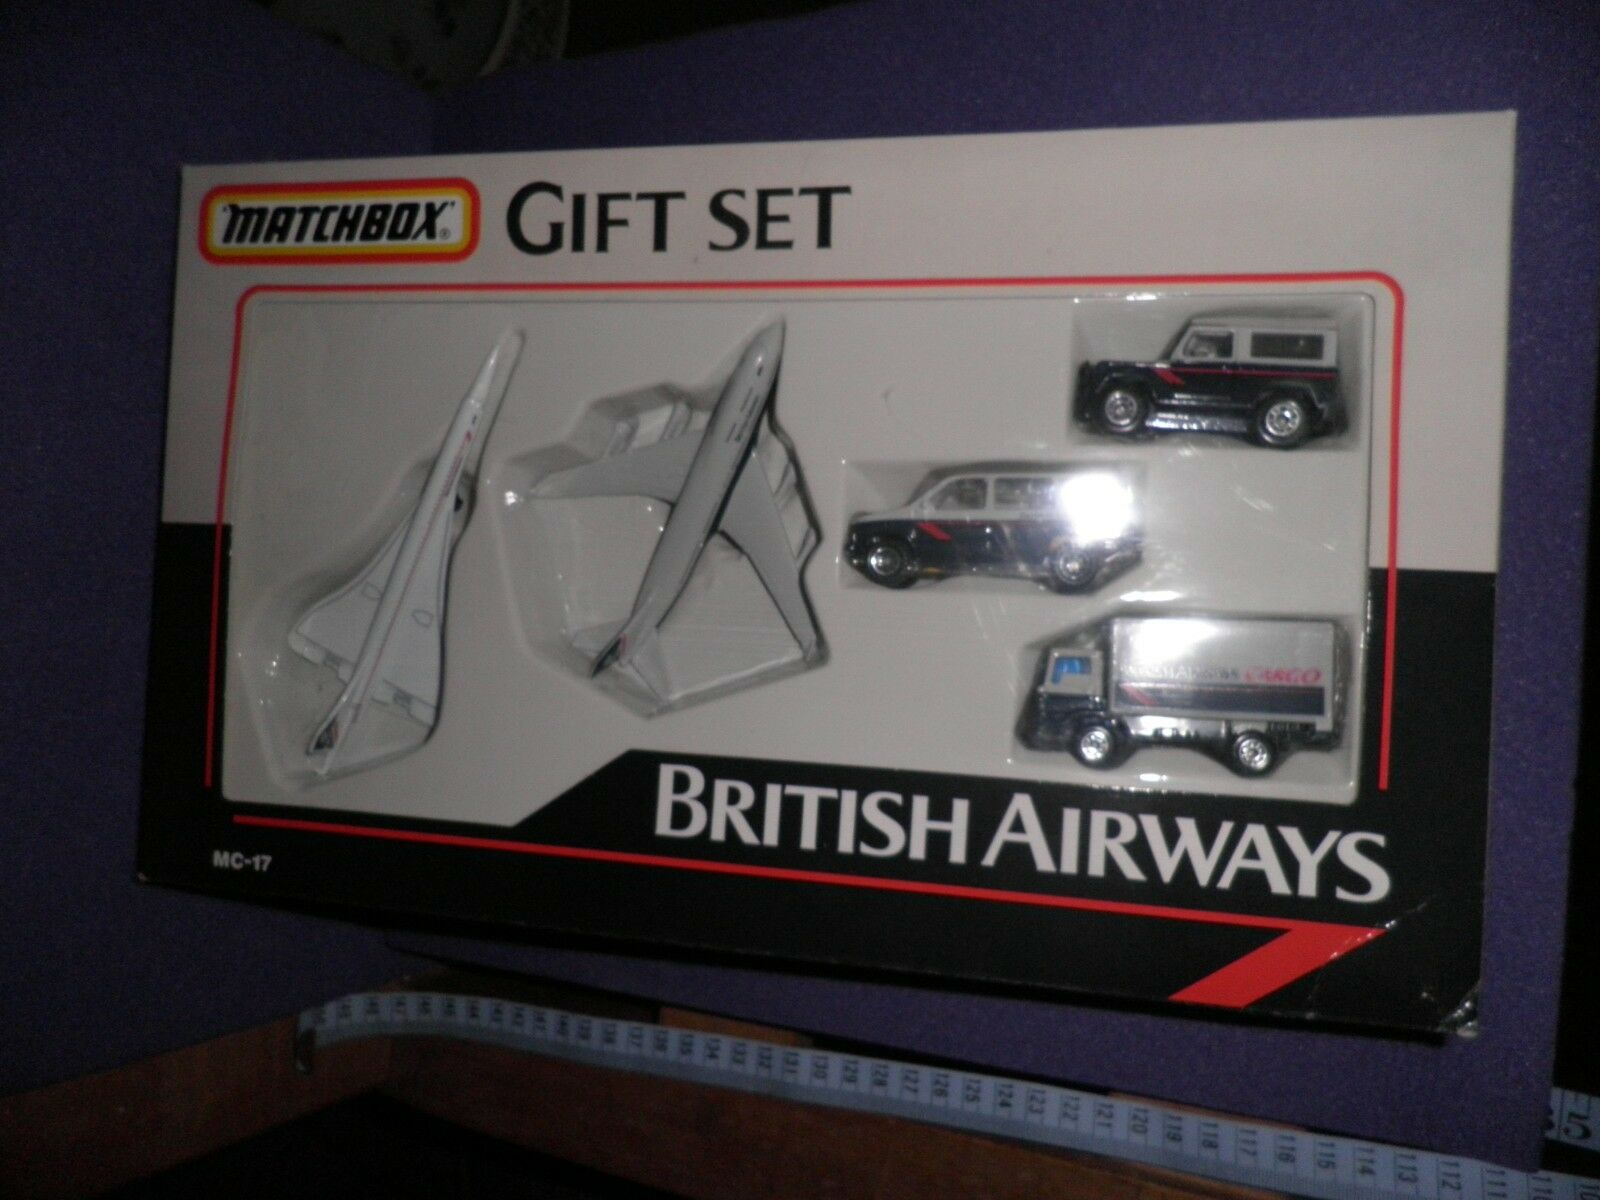 1990 Matchbox MC-17 British Airways Gift Set Boxed